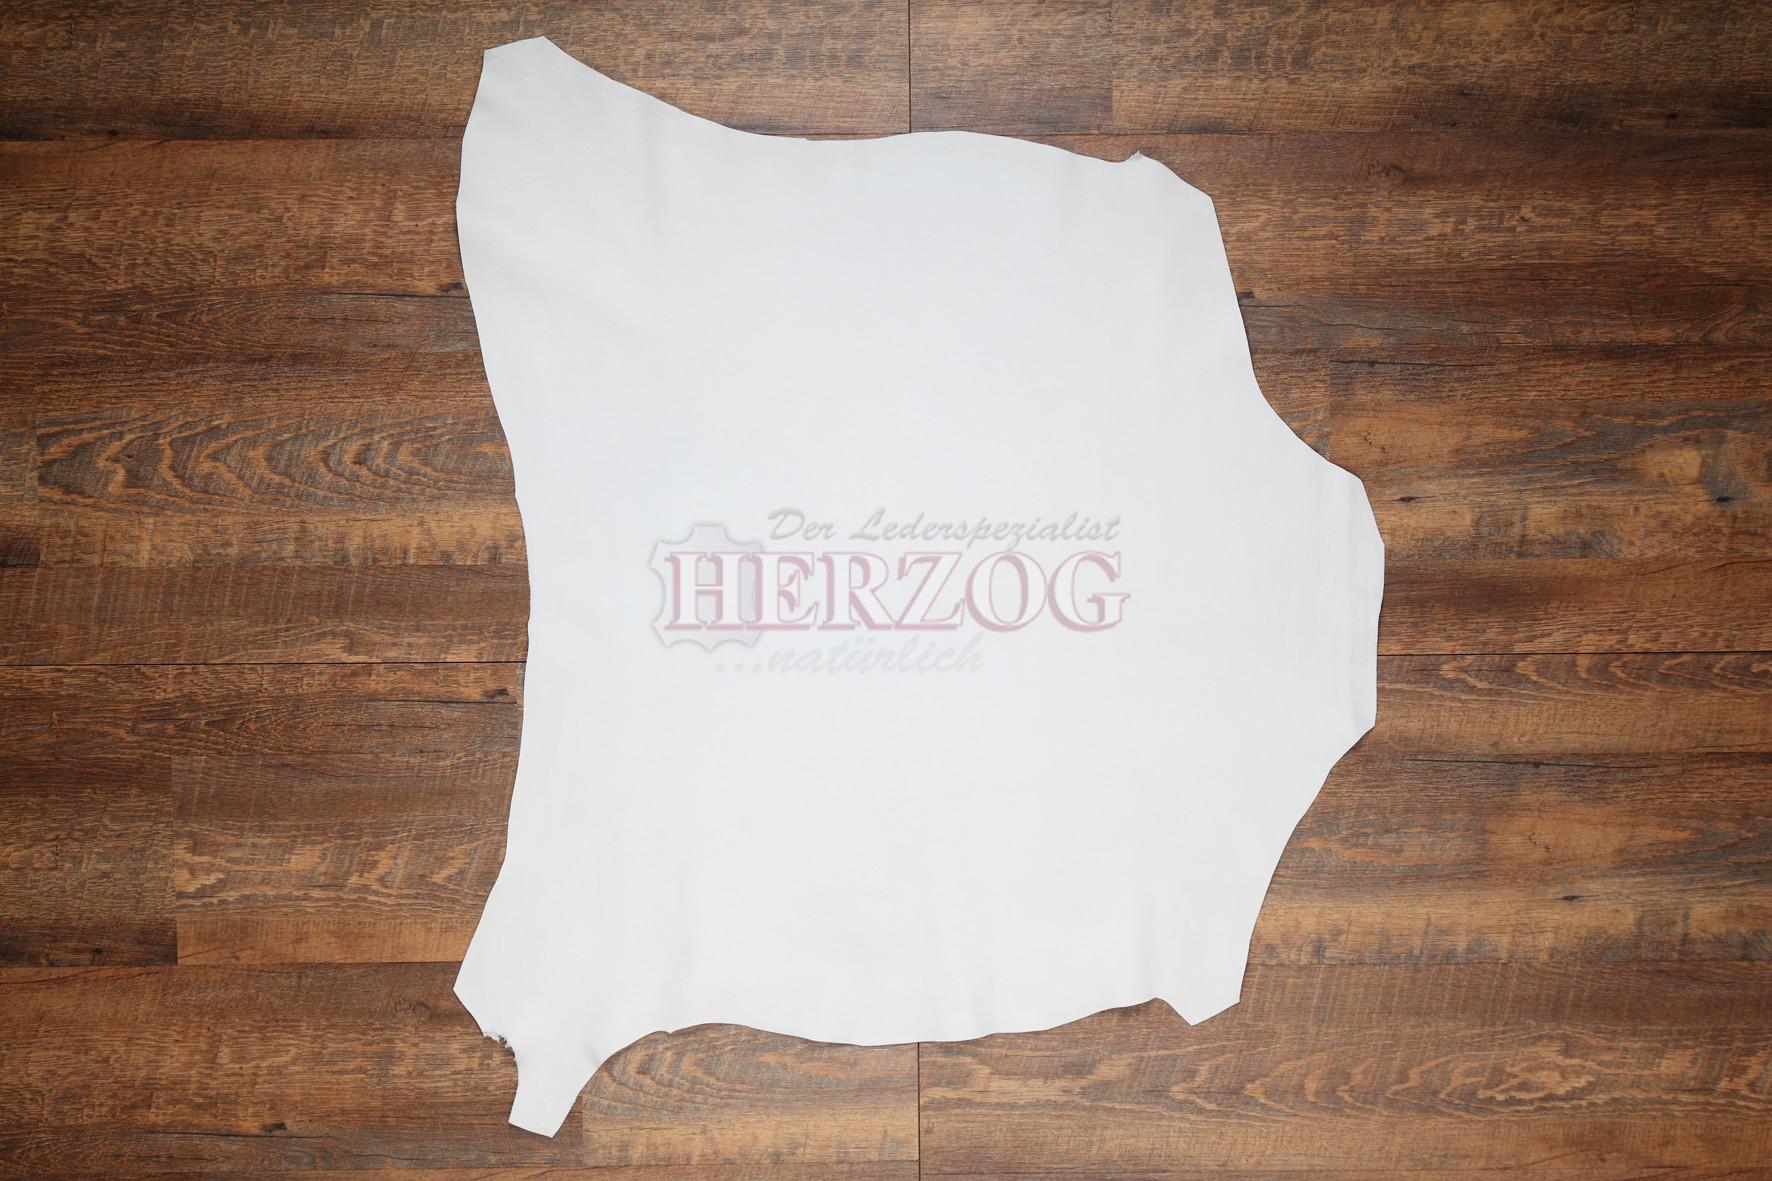 Herzog Glacéleder (ganzes Fell)